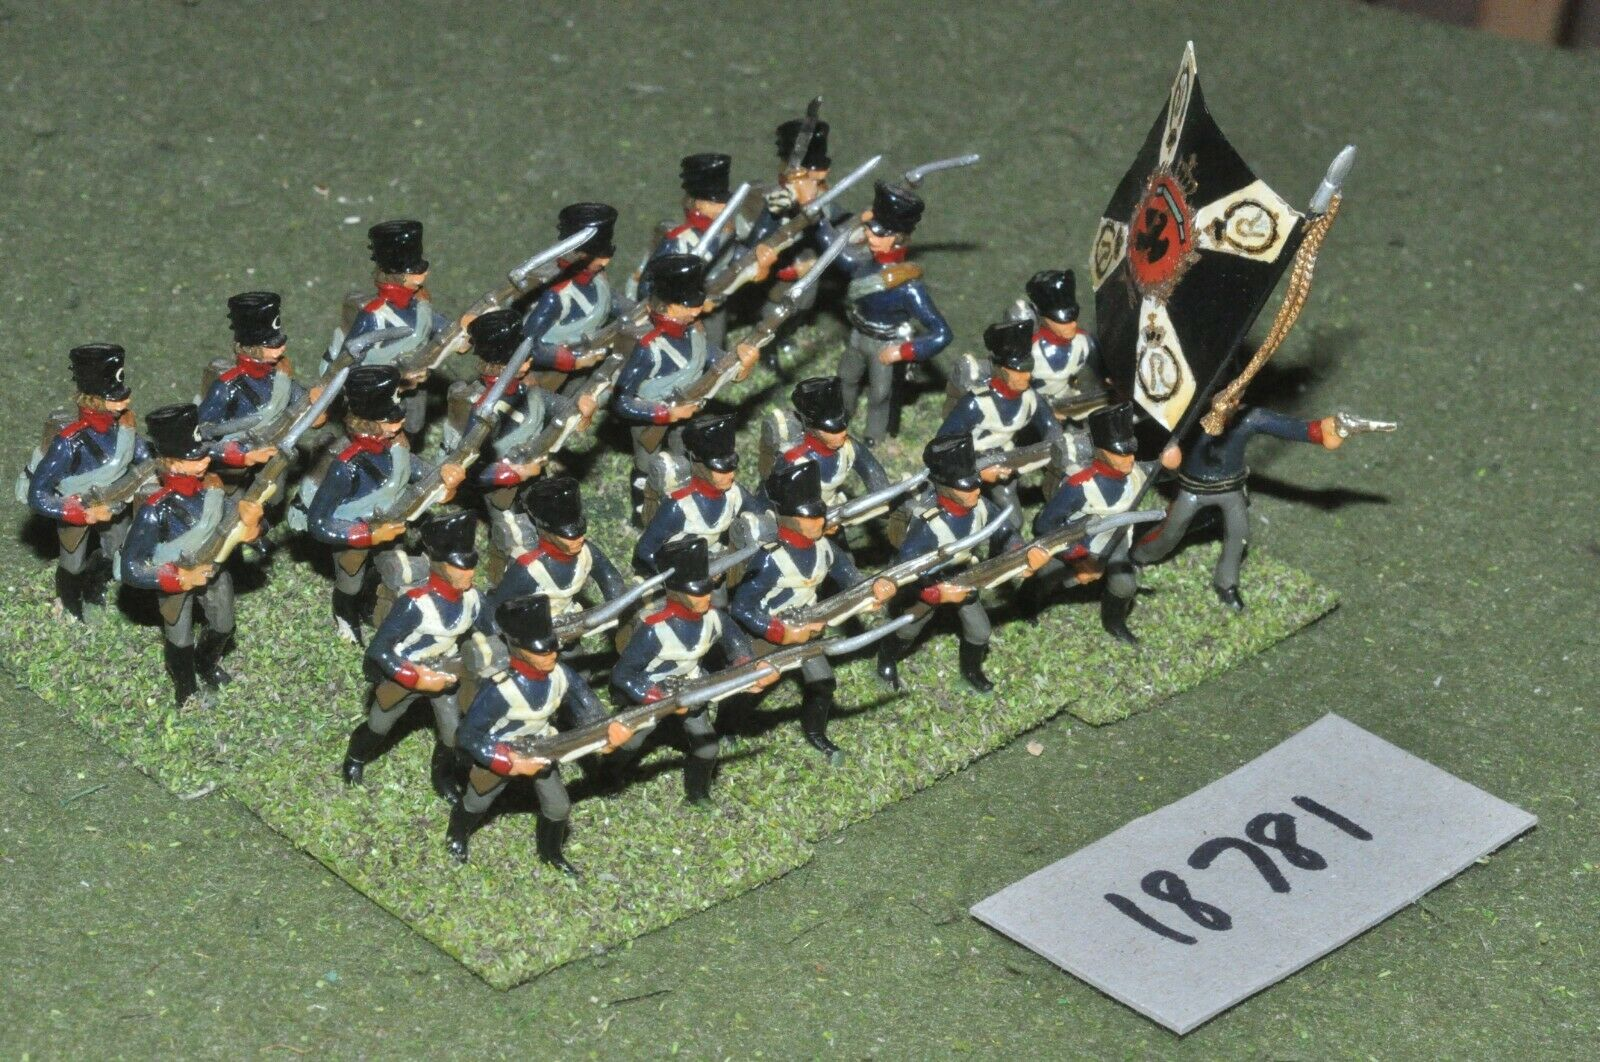 25mm Infantería Napoleónicas Prusia - 24 figuras-INF (18781)